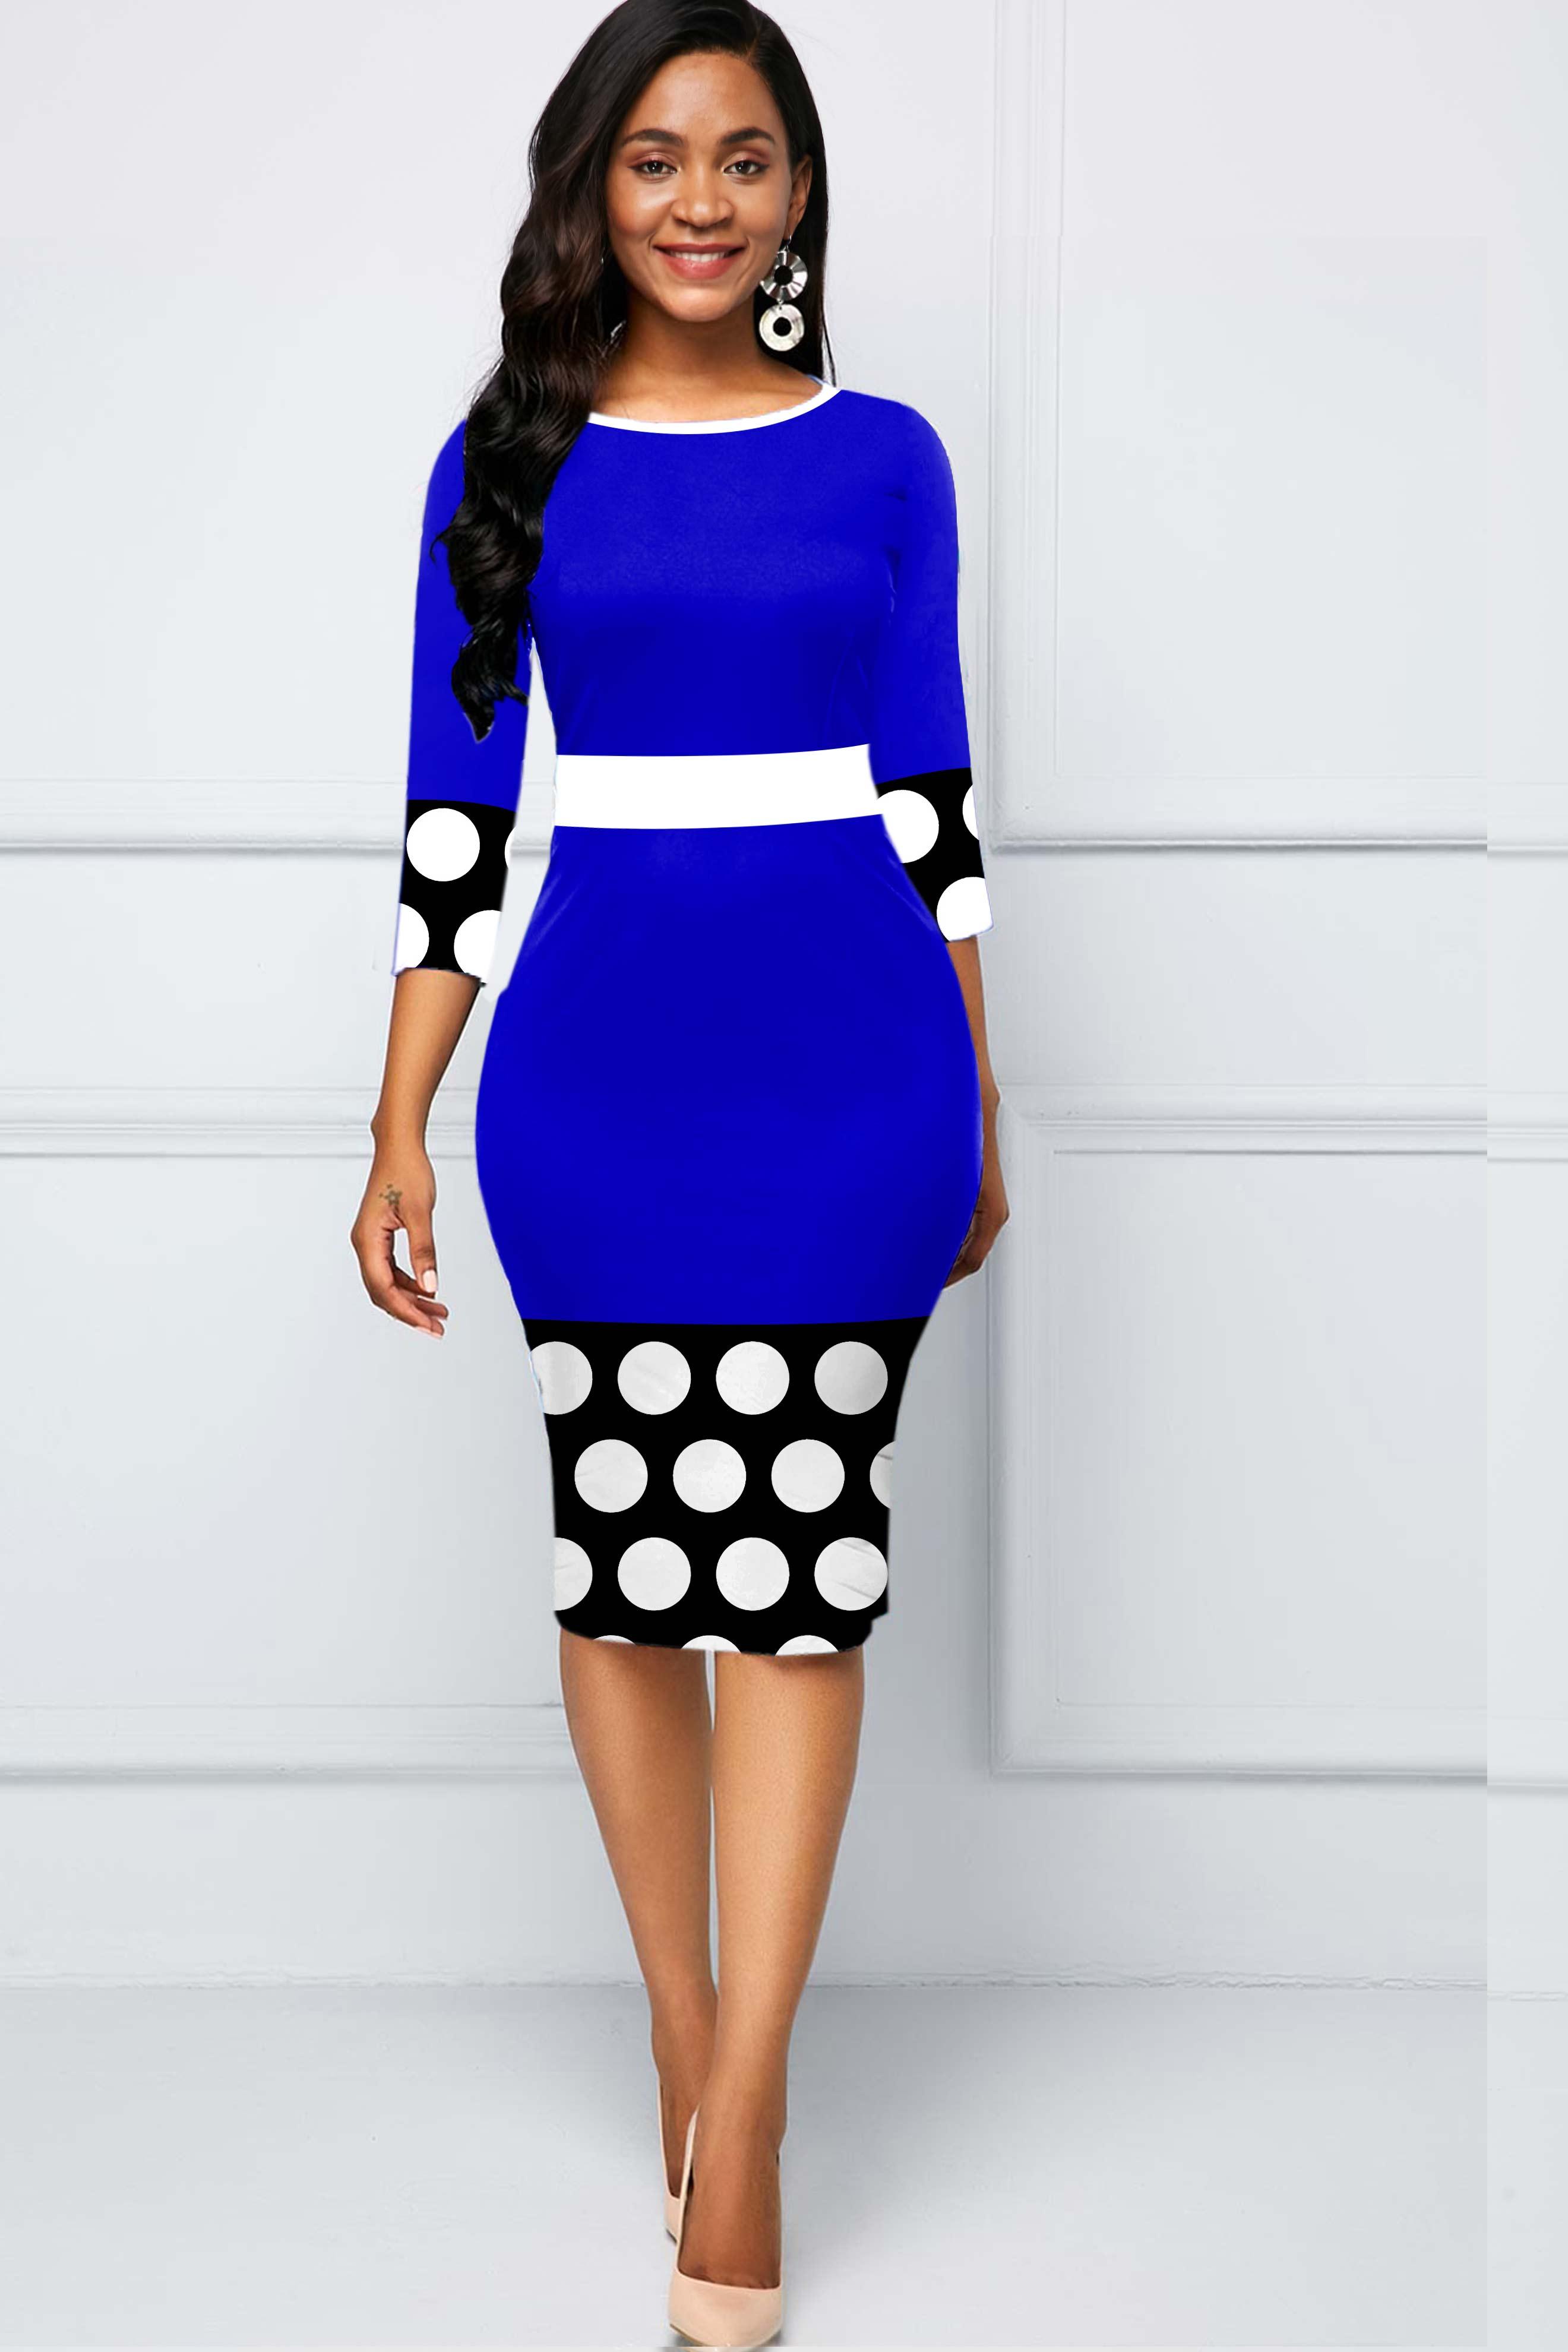 ROTITA Contrast Polka Dot Round Neck Dress